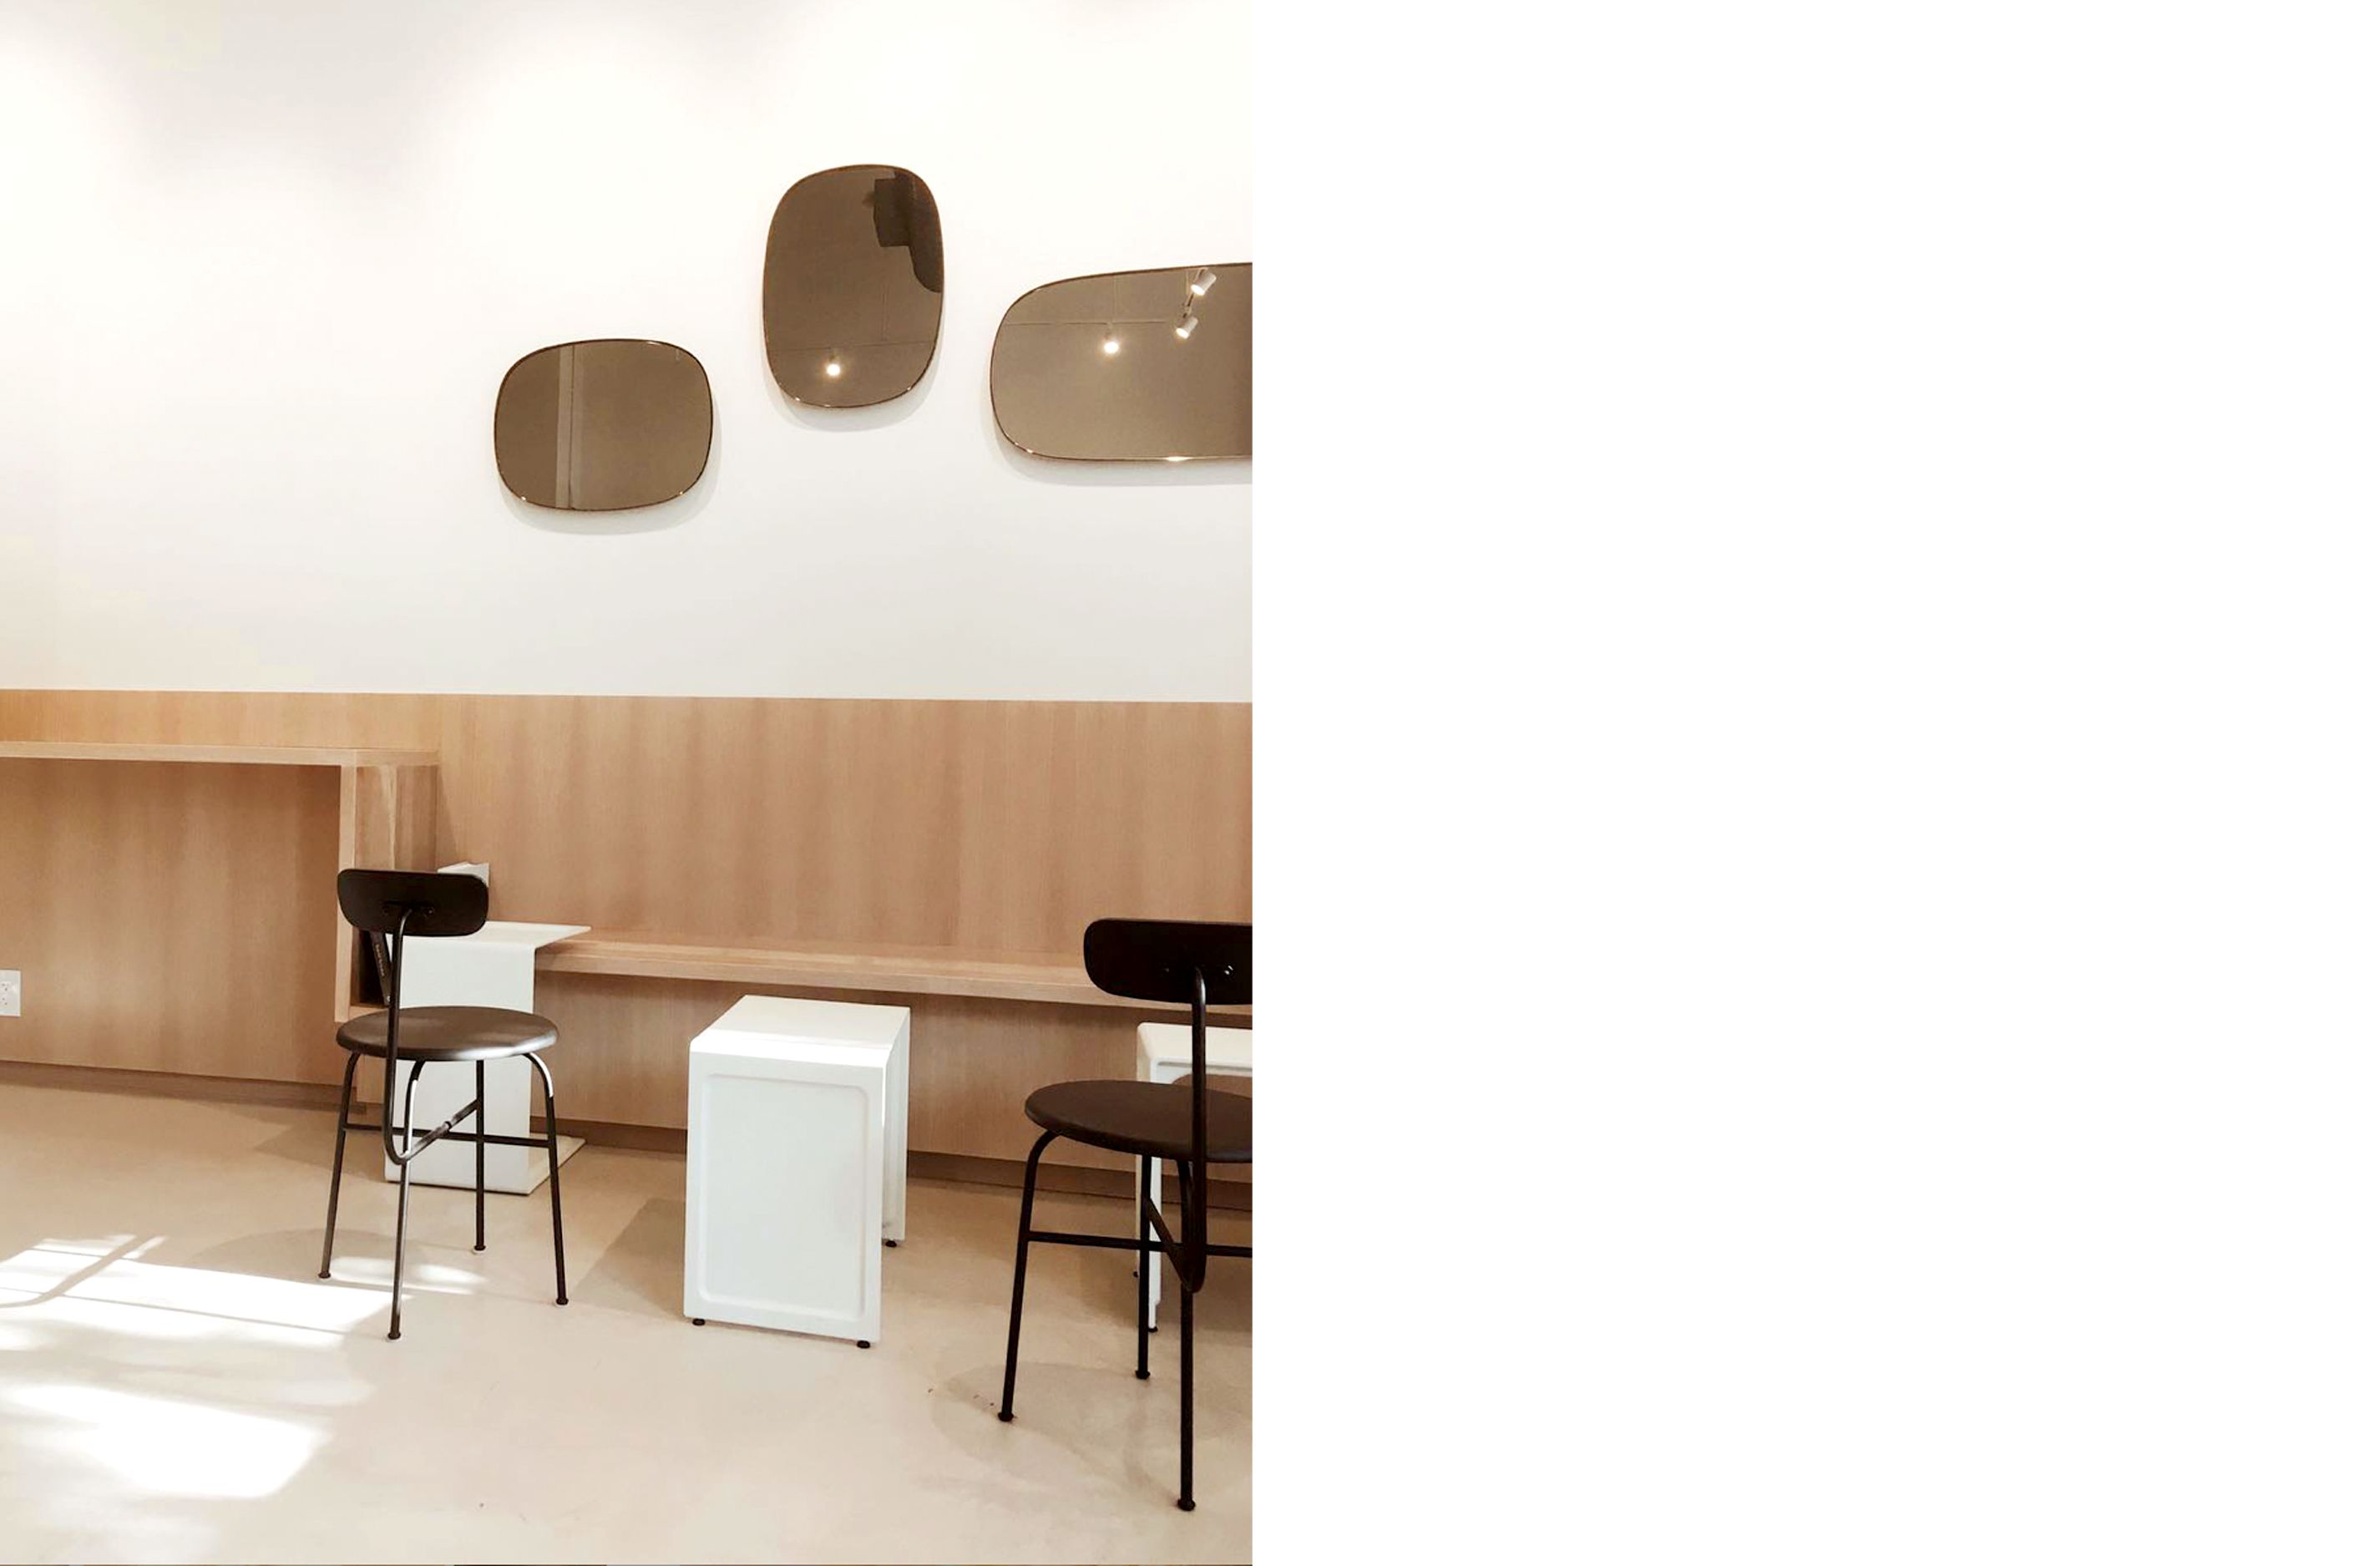 interlude bench mirrors